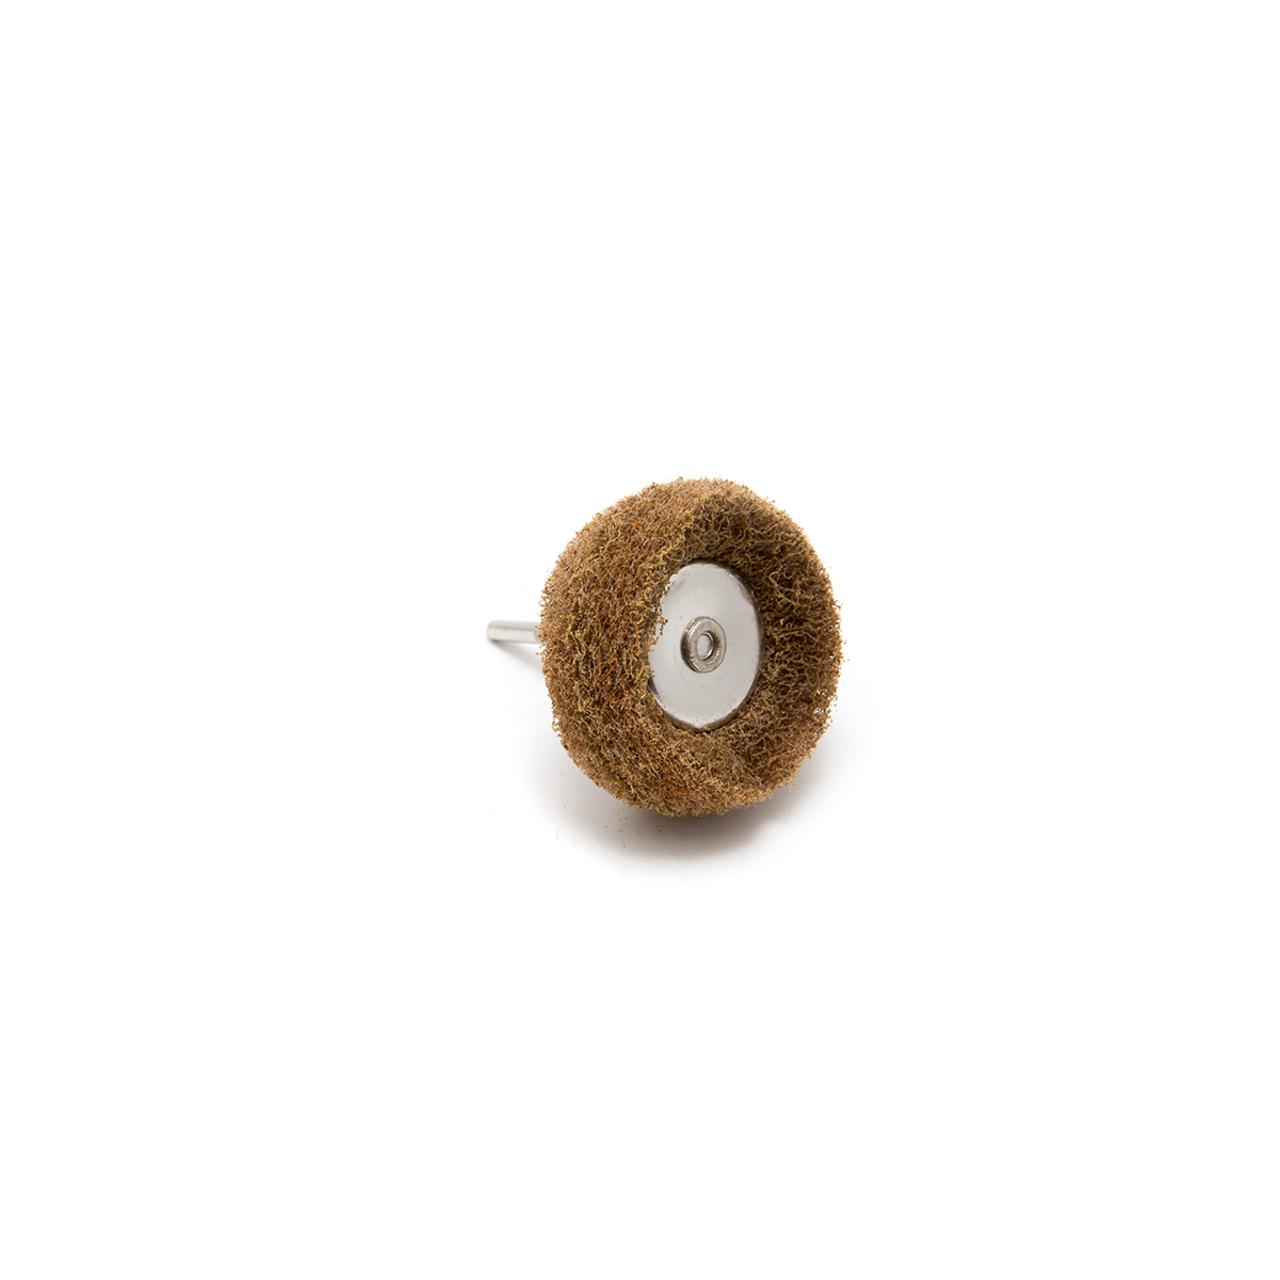 Abrasive Wheel Buff - 80 Grit, Light Brown, 38mm